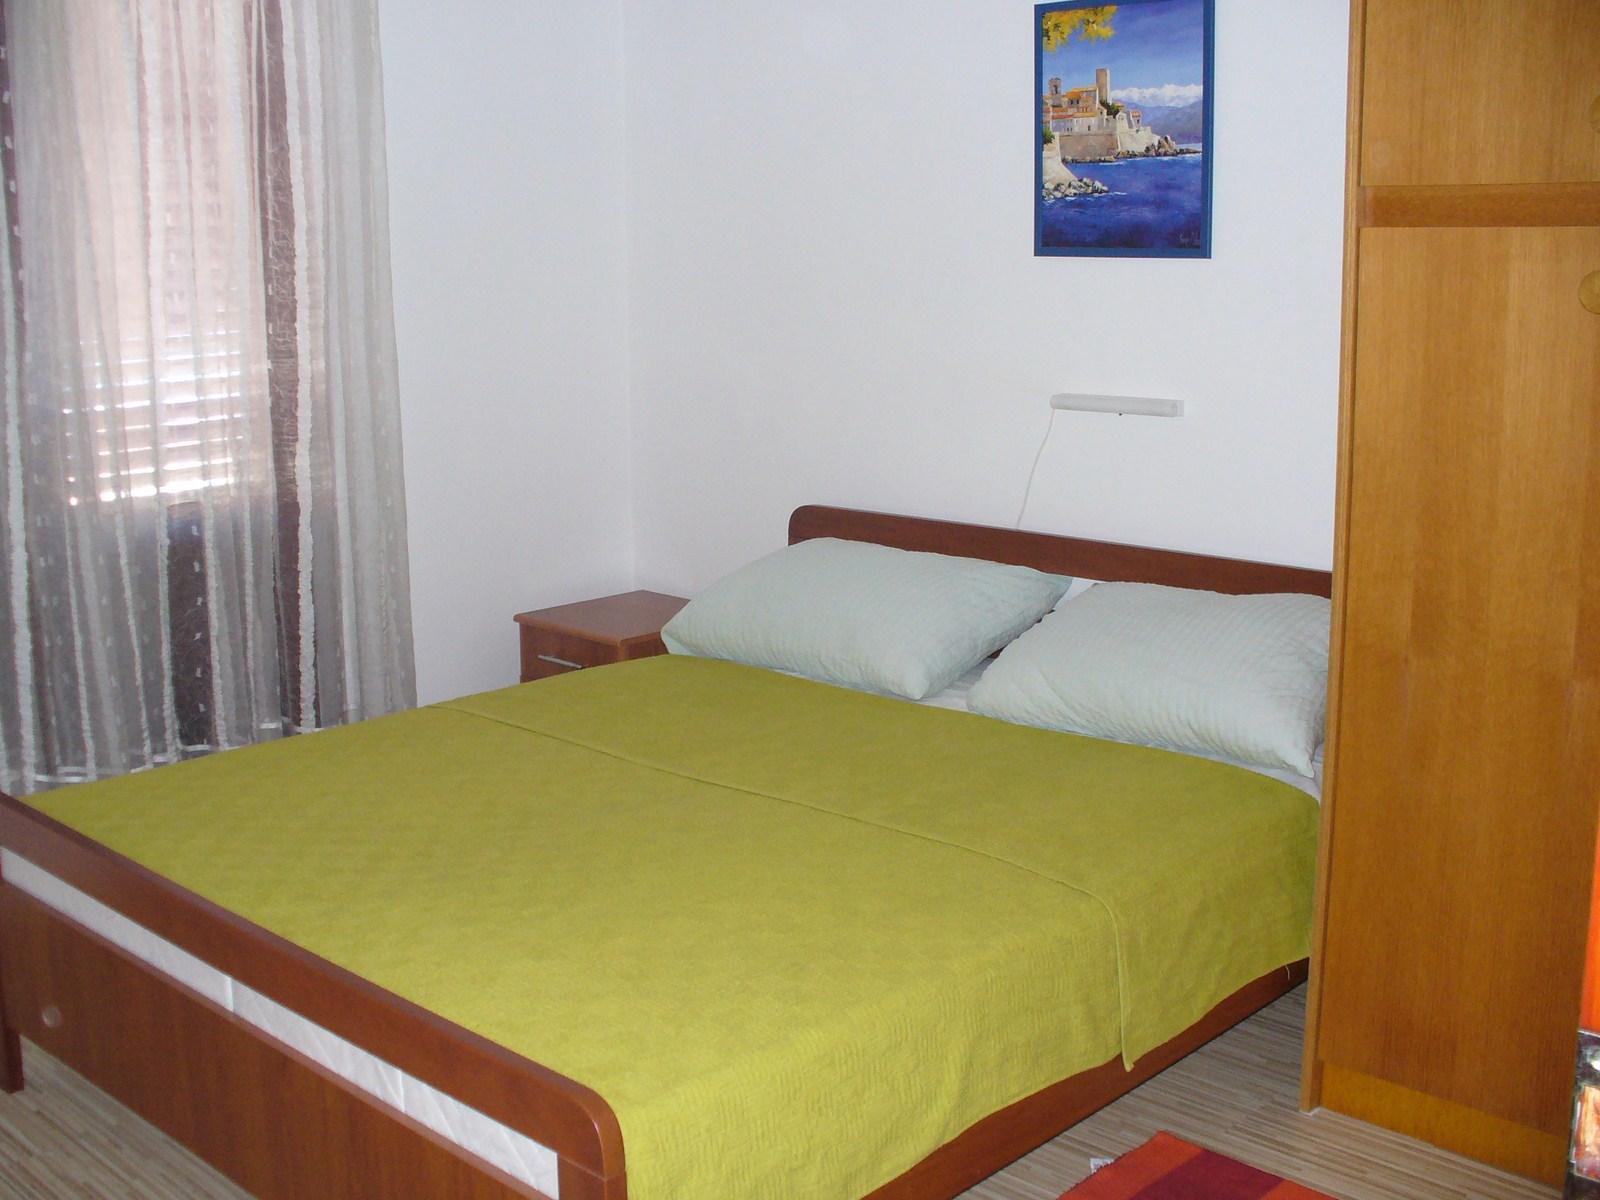 Ferienwohnung Nada A3 Veliki (4+2) - Kali (743893), Kali, Insel Ugljan, Dalmatien, Kroatien, Bild 12